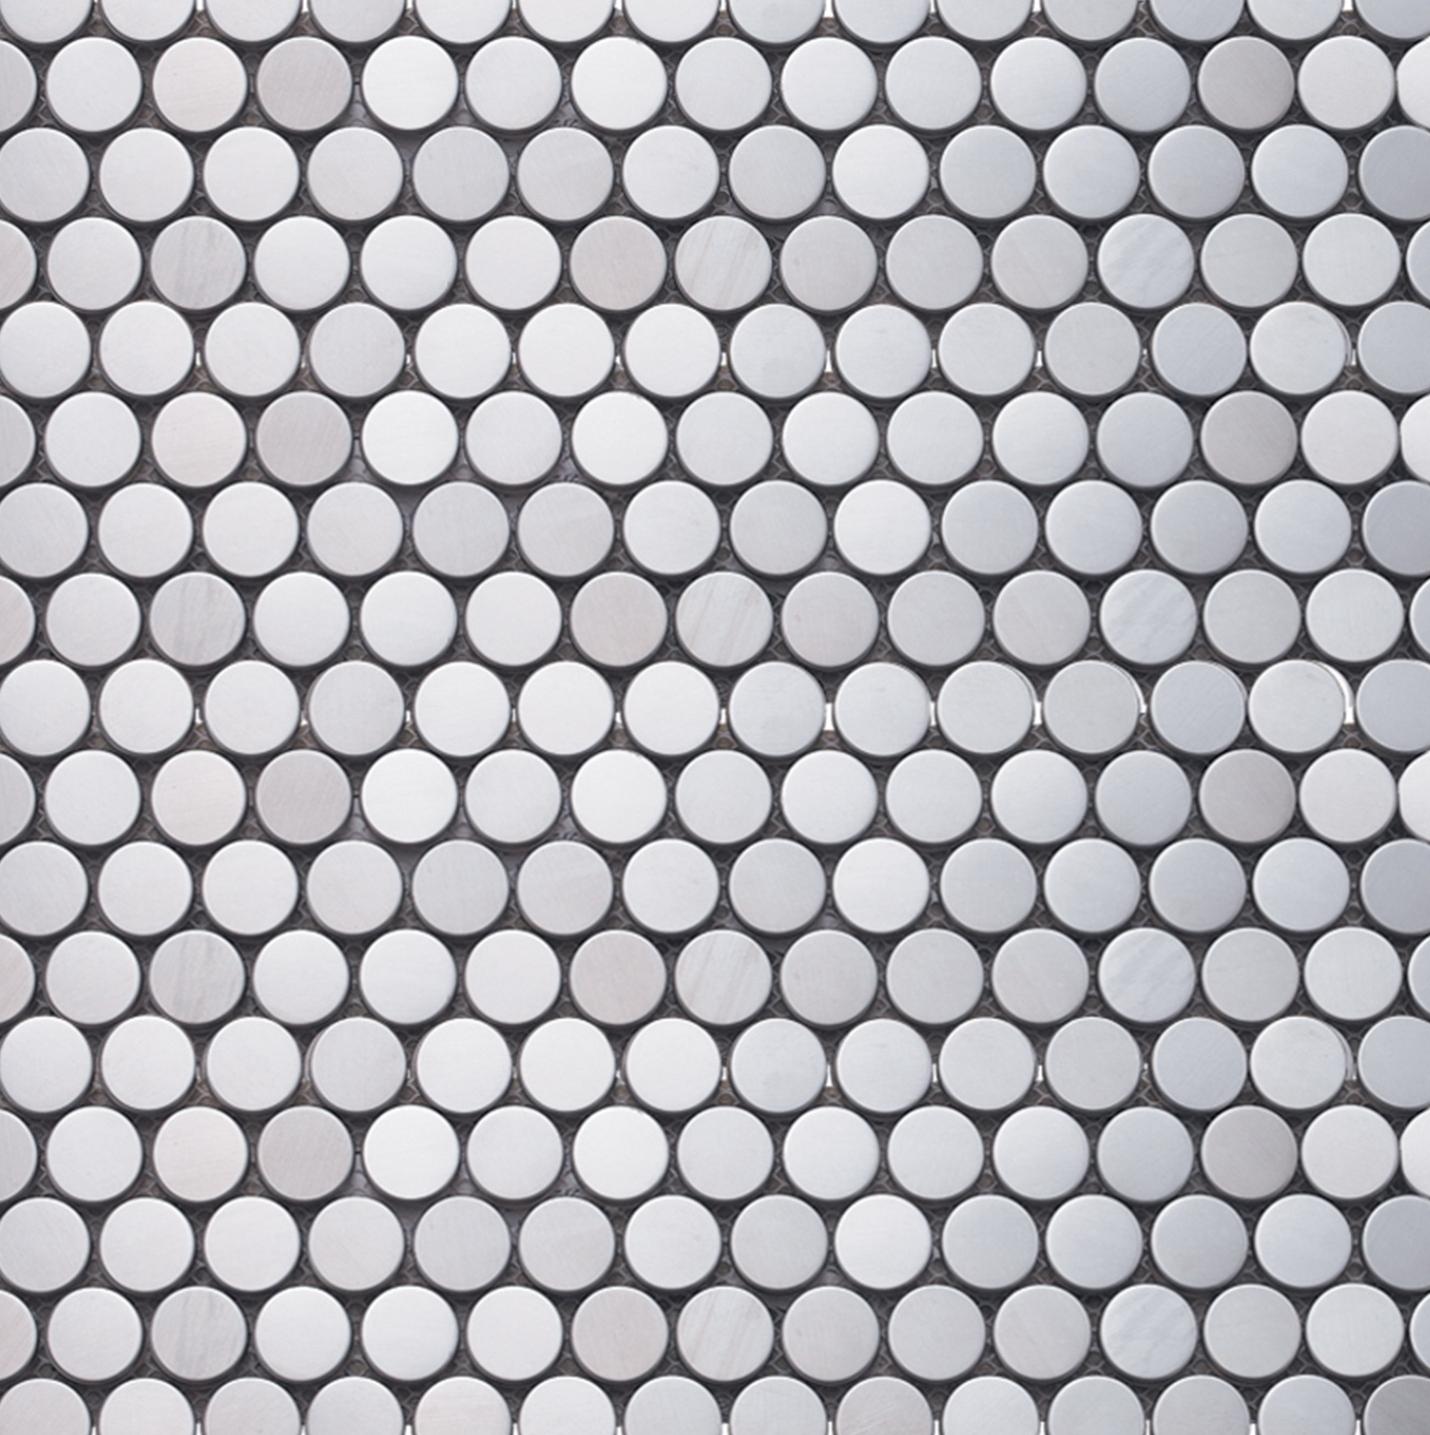 Inox Mosaics Penny Round Silver